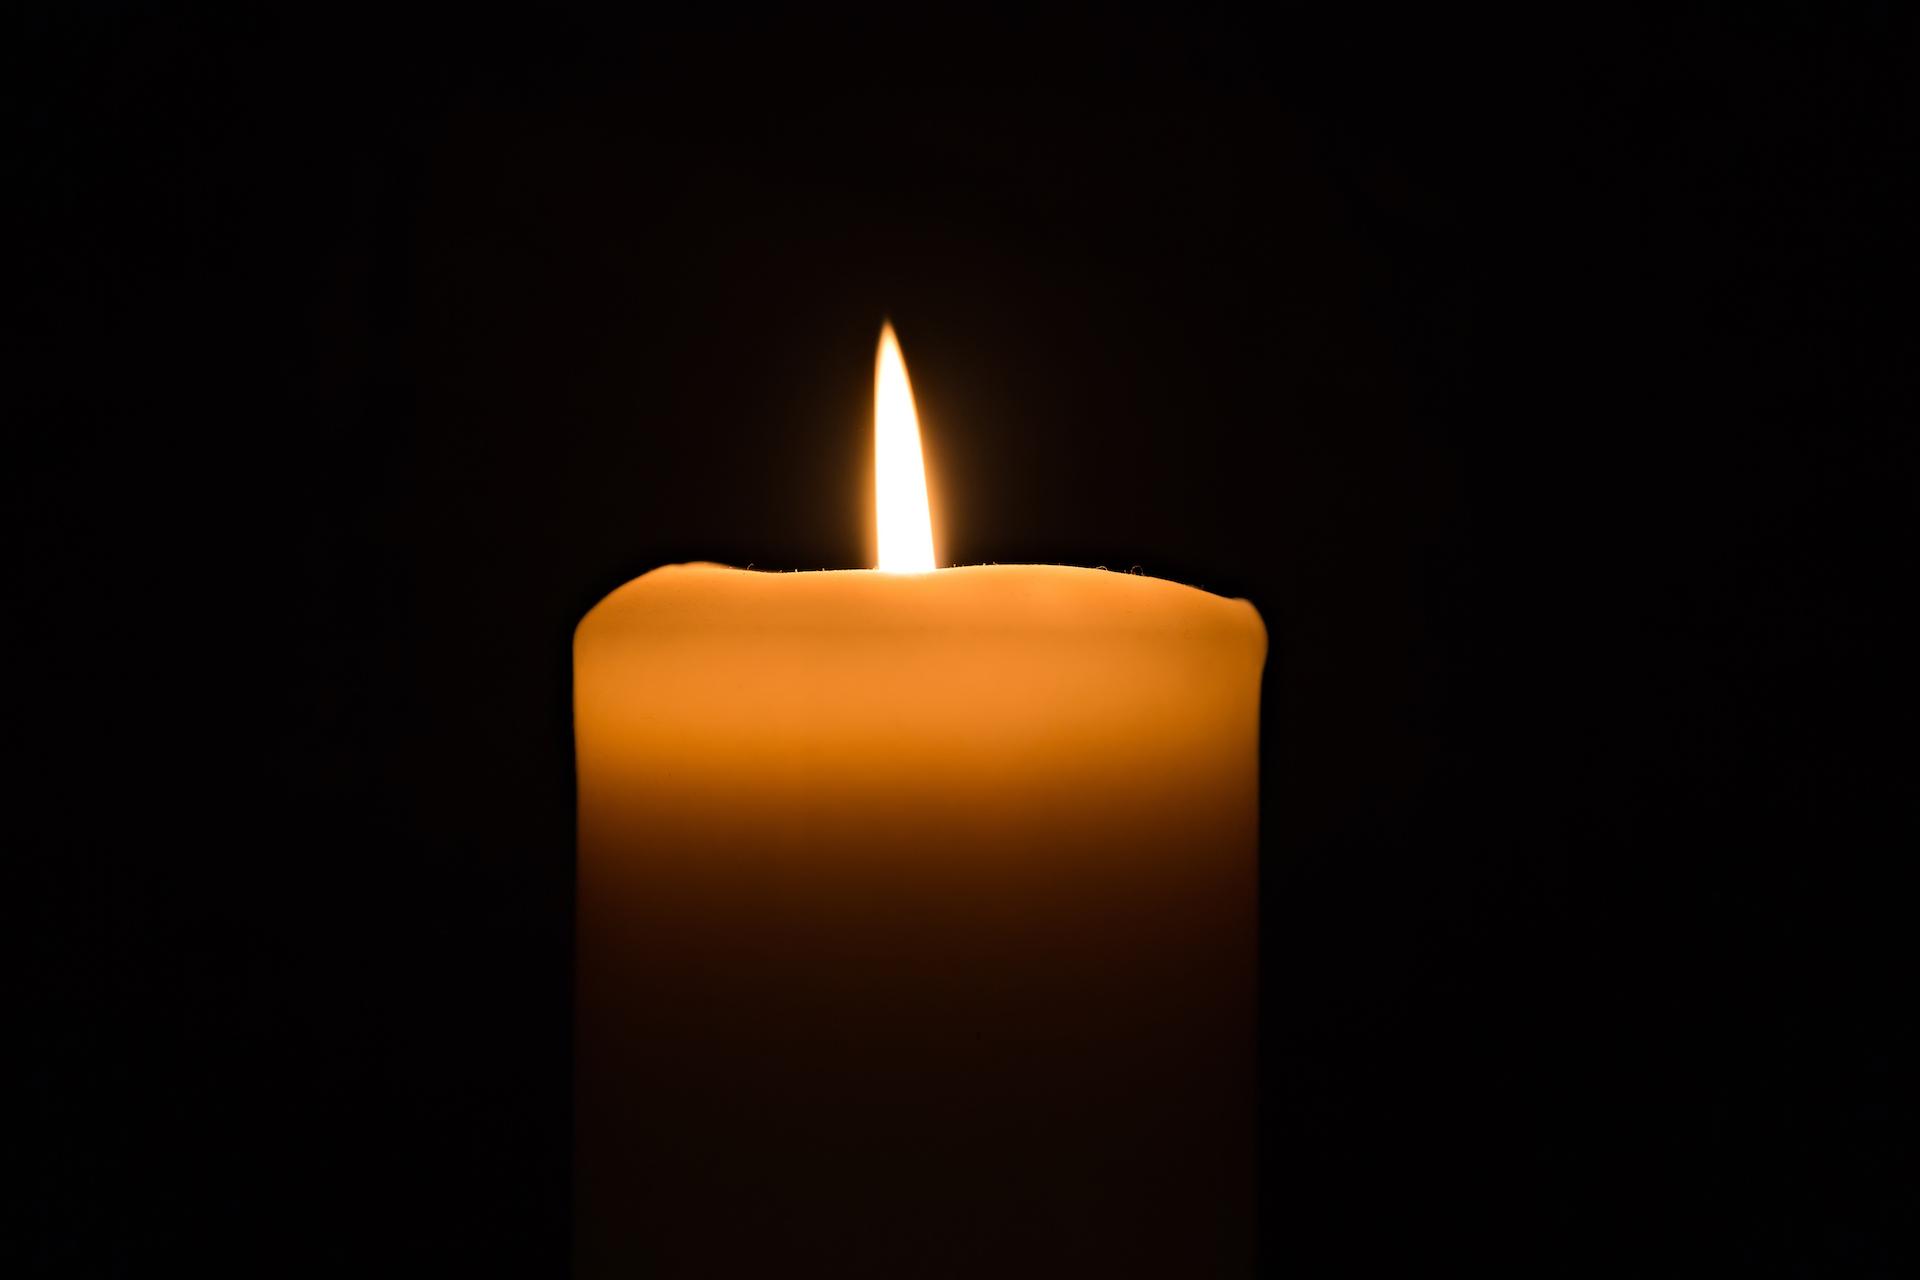 Single candle burning burning brightly in the black background.